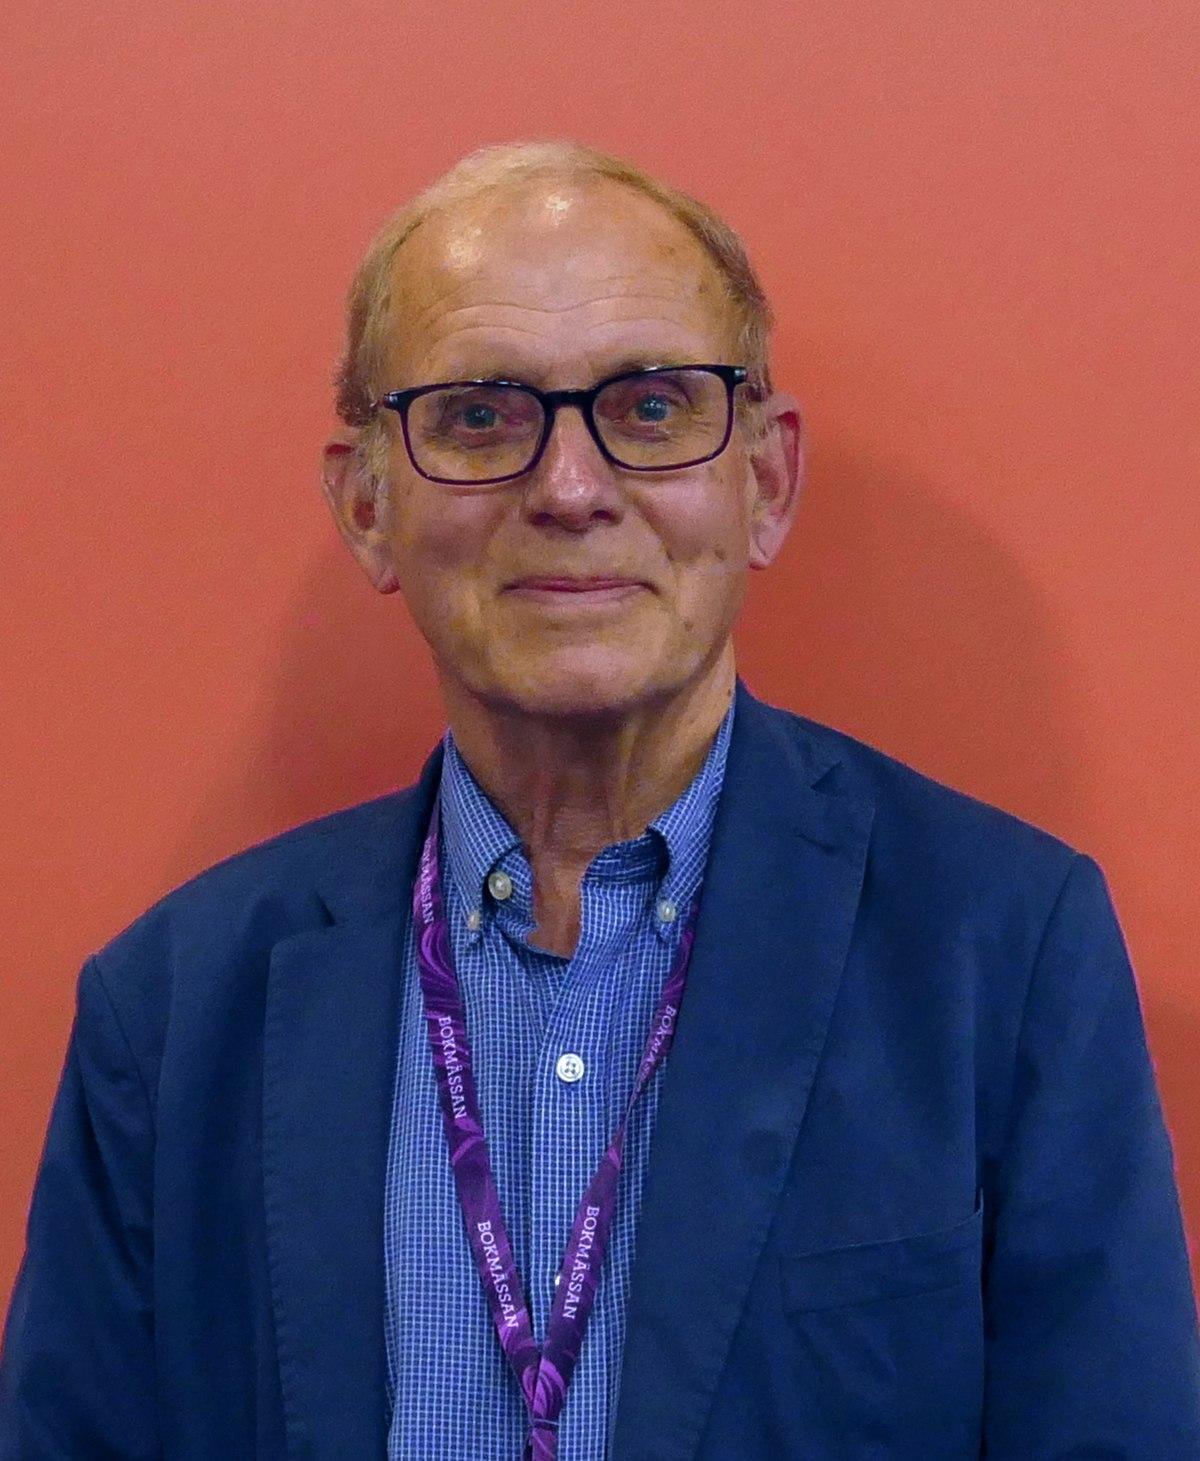 Åke Ohlmarks - Wikipedia